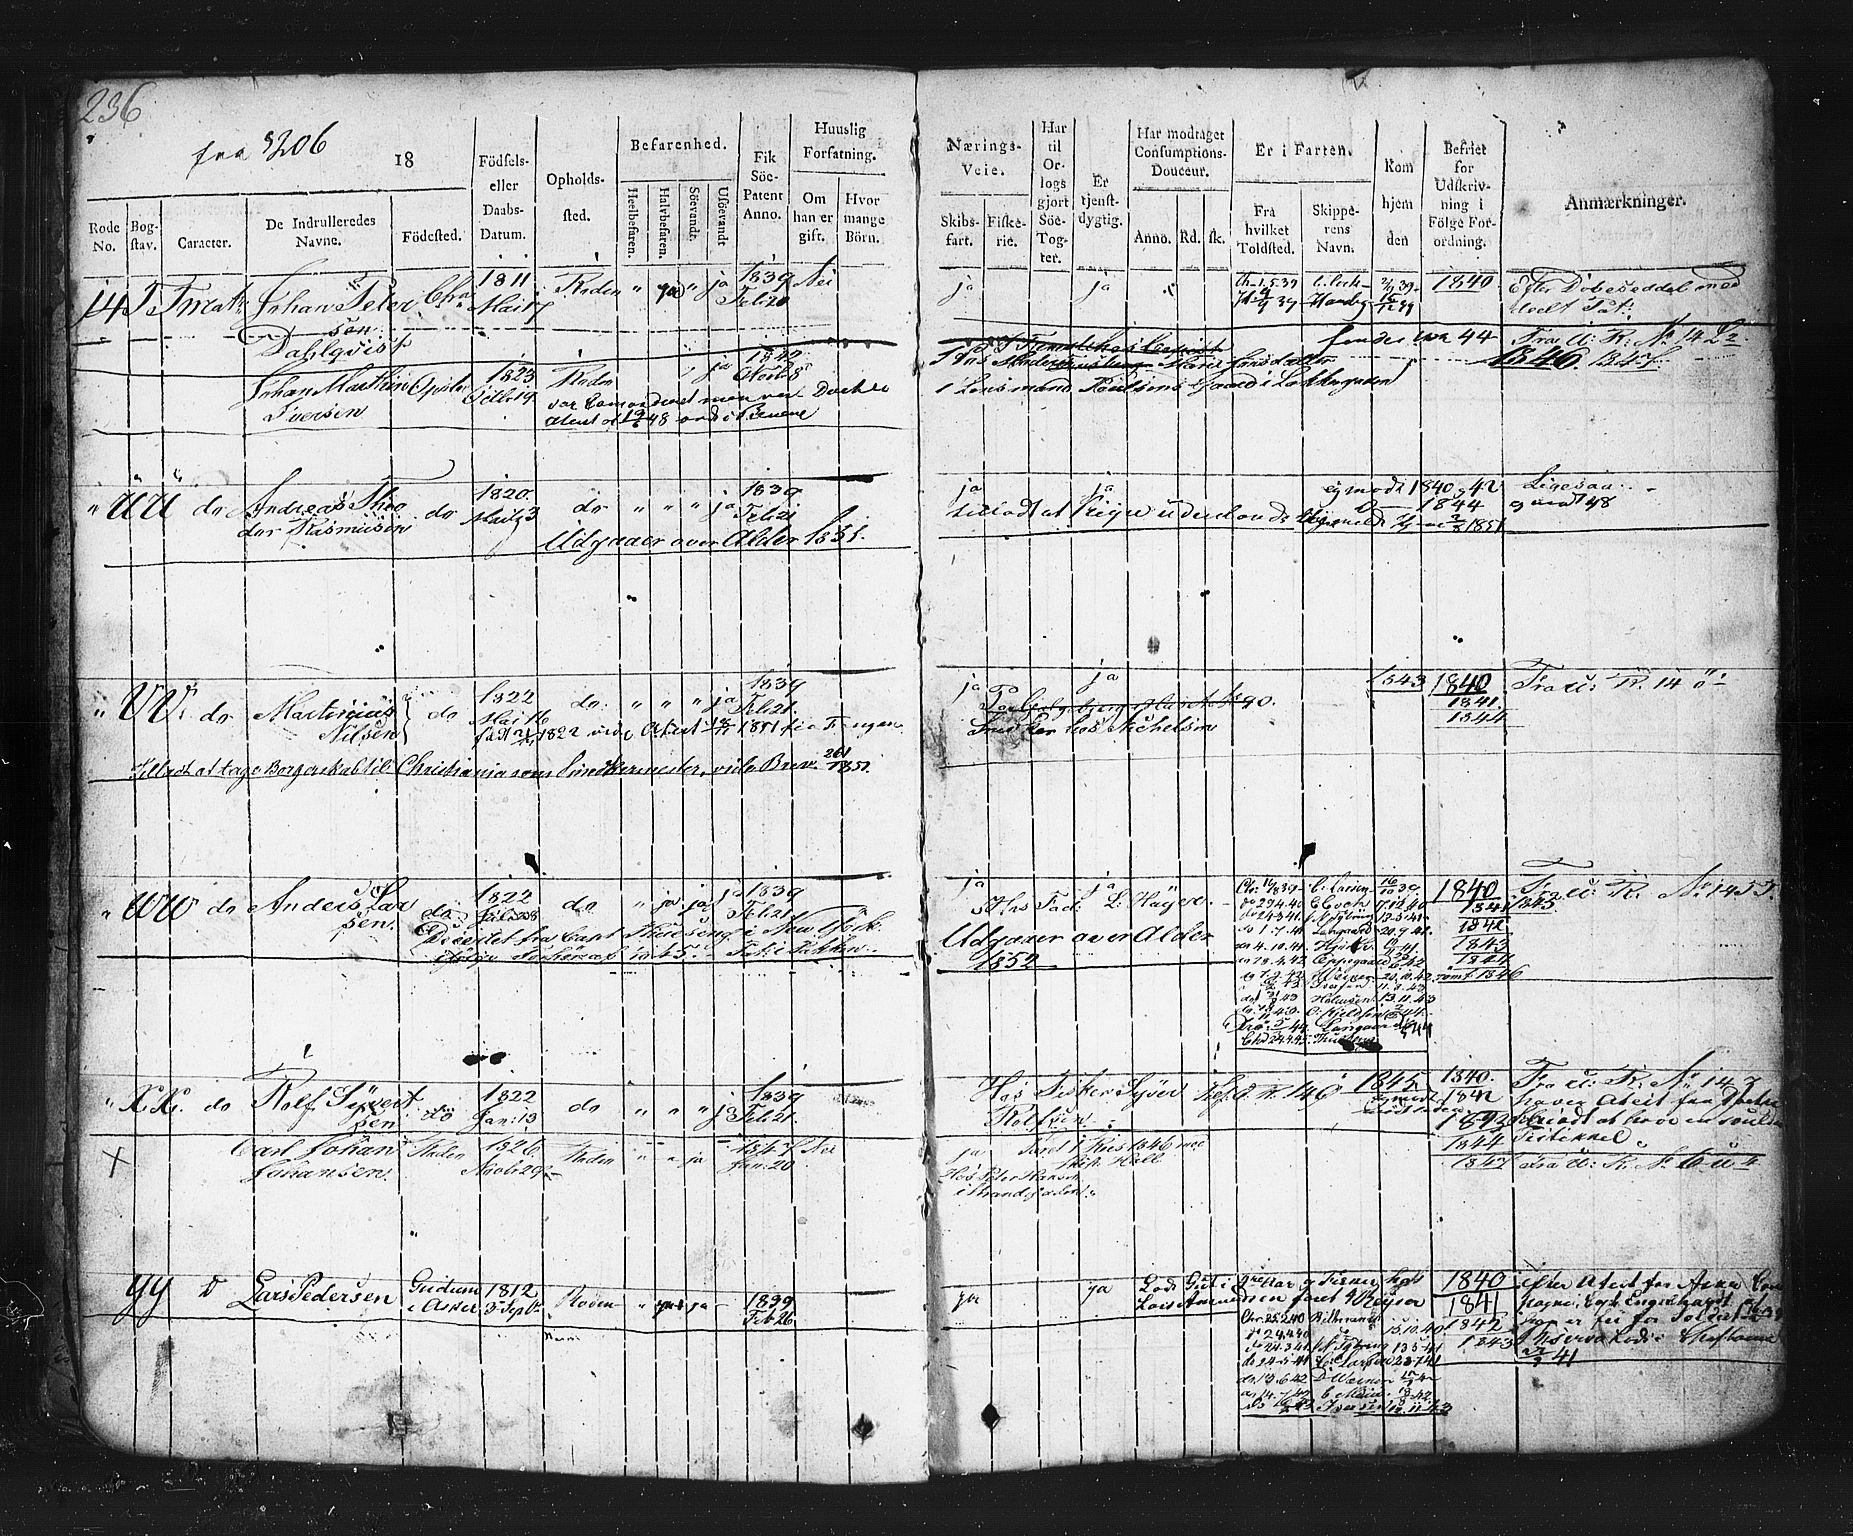 SAO, Oslo mønstringskontor, F/Fc/Fcb/L0001: Hovedrulle, 1819, s. 236